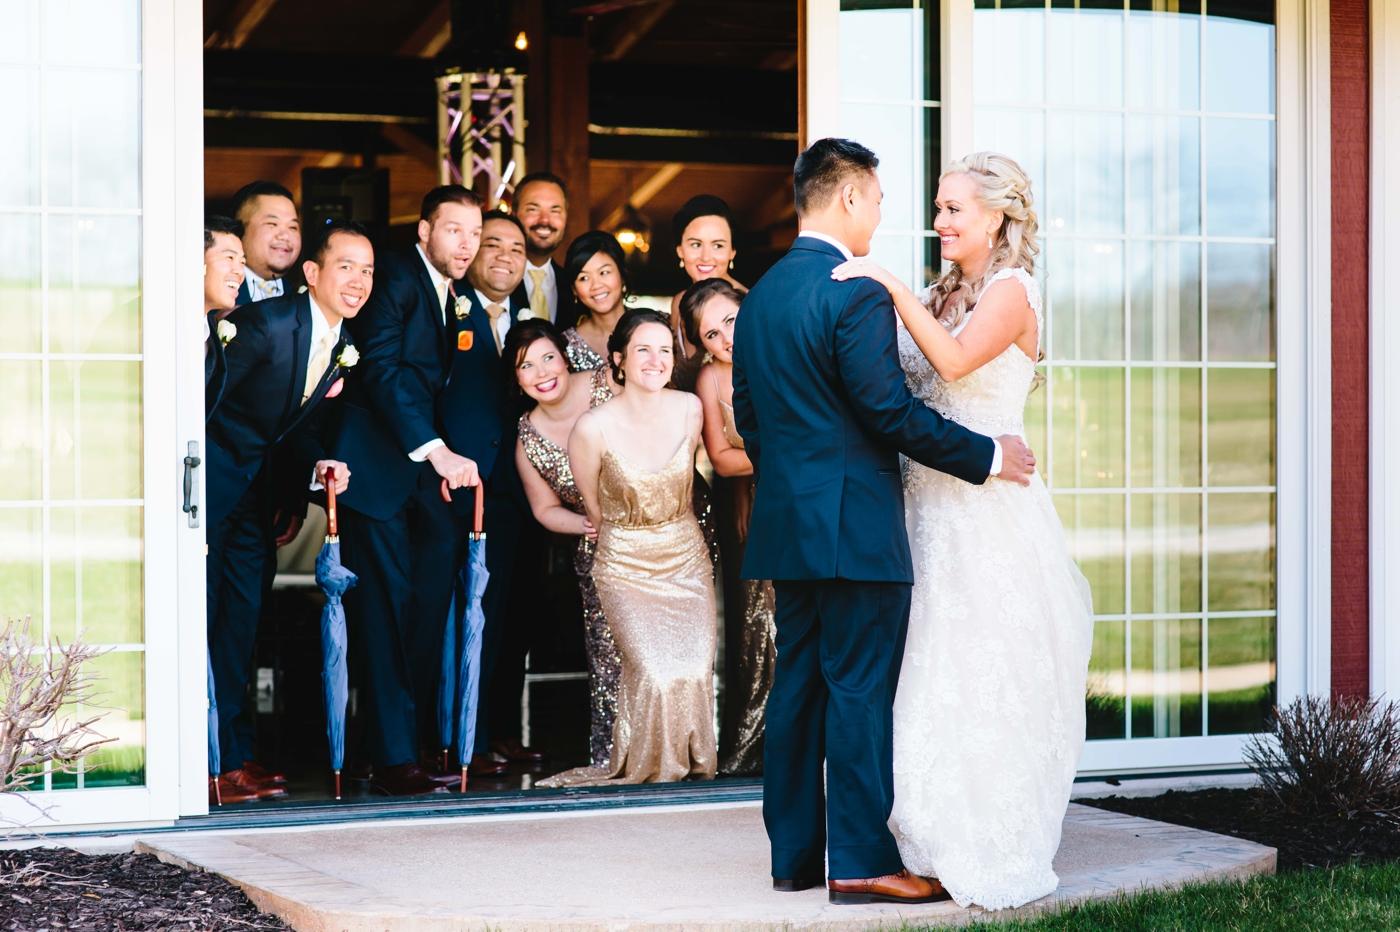 chicago-fine-art-wedding-photography-vo14